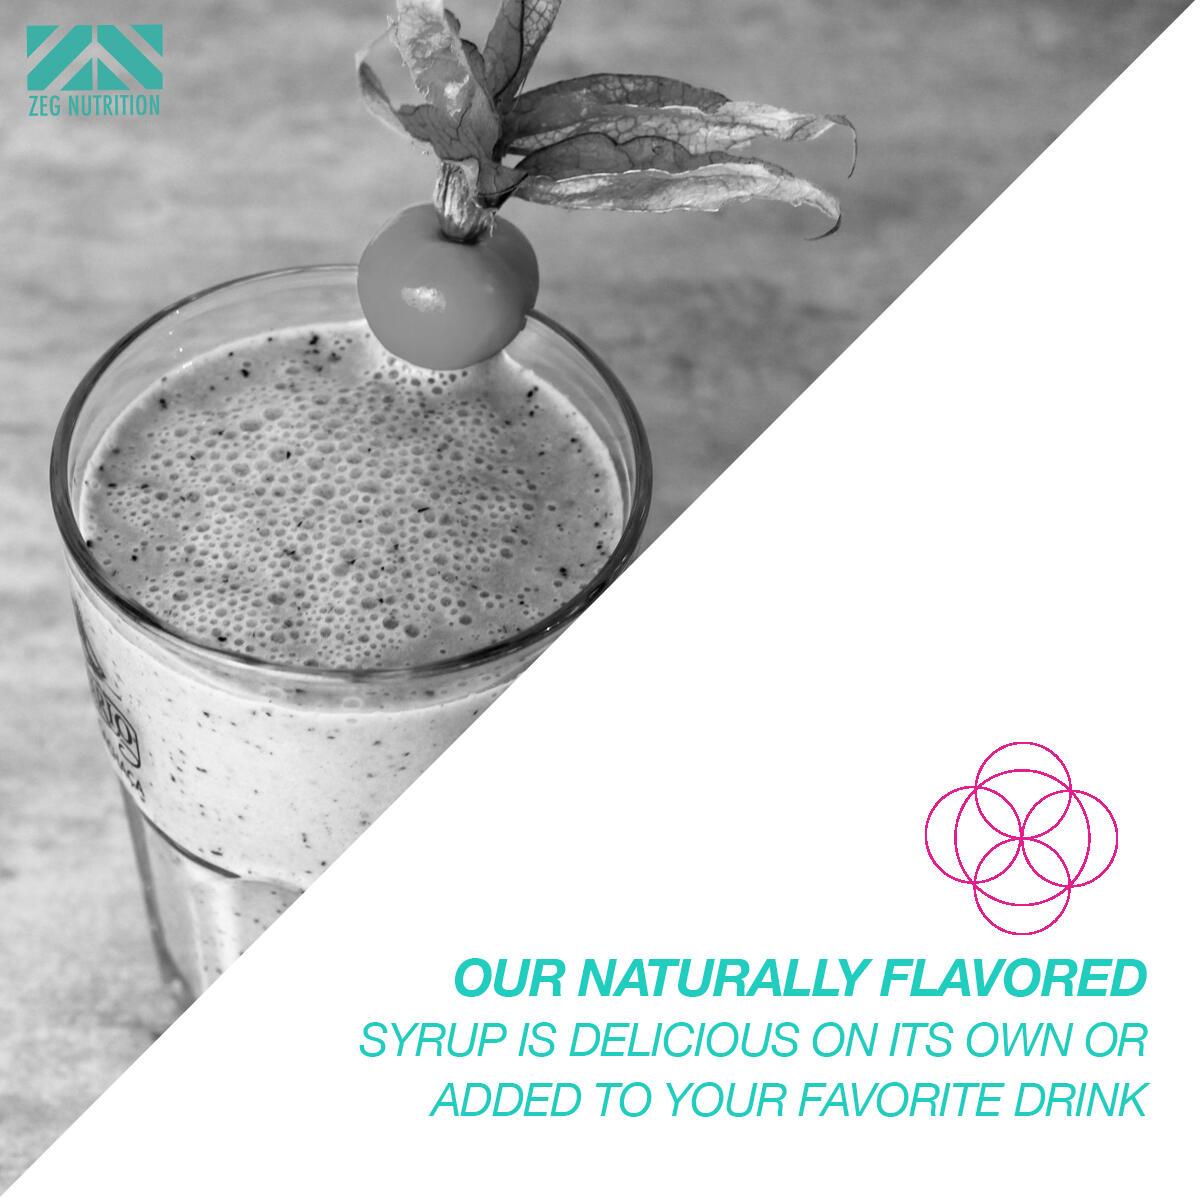 Organic Liquid Elderberry - Immune System Support Syrup - Maximum Strength 400mg Organic Sambucus Elderberry for Adults - Easy Drops Formula - 1oz - 30 Servings